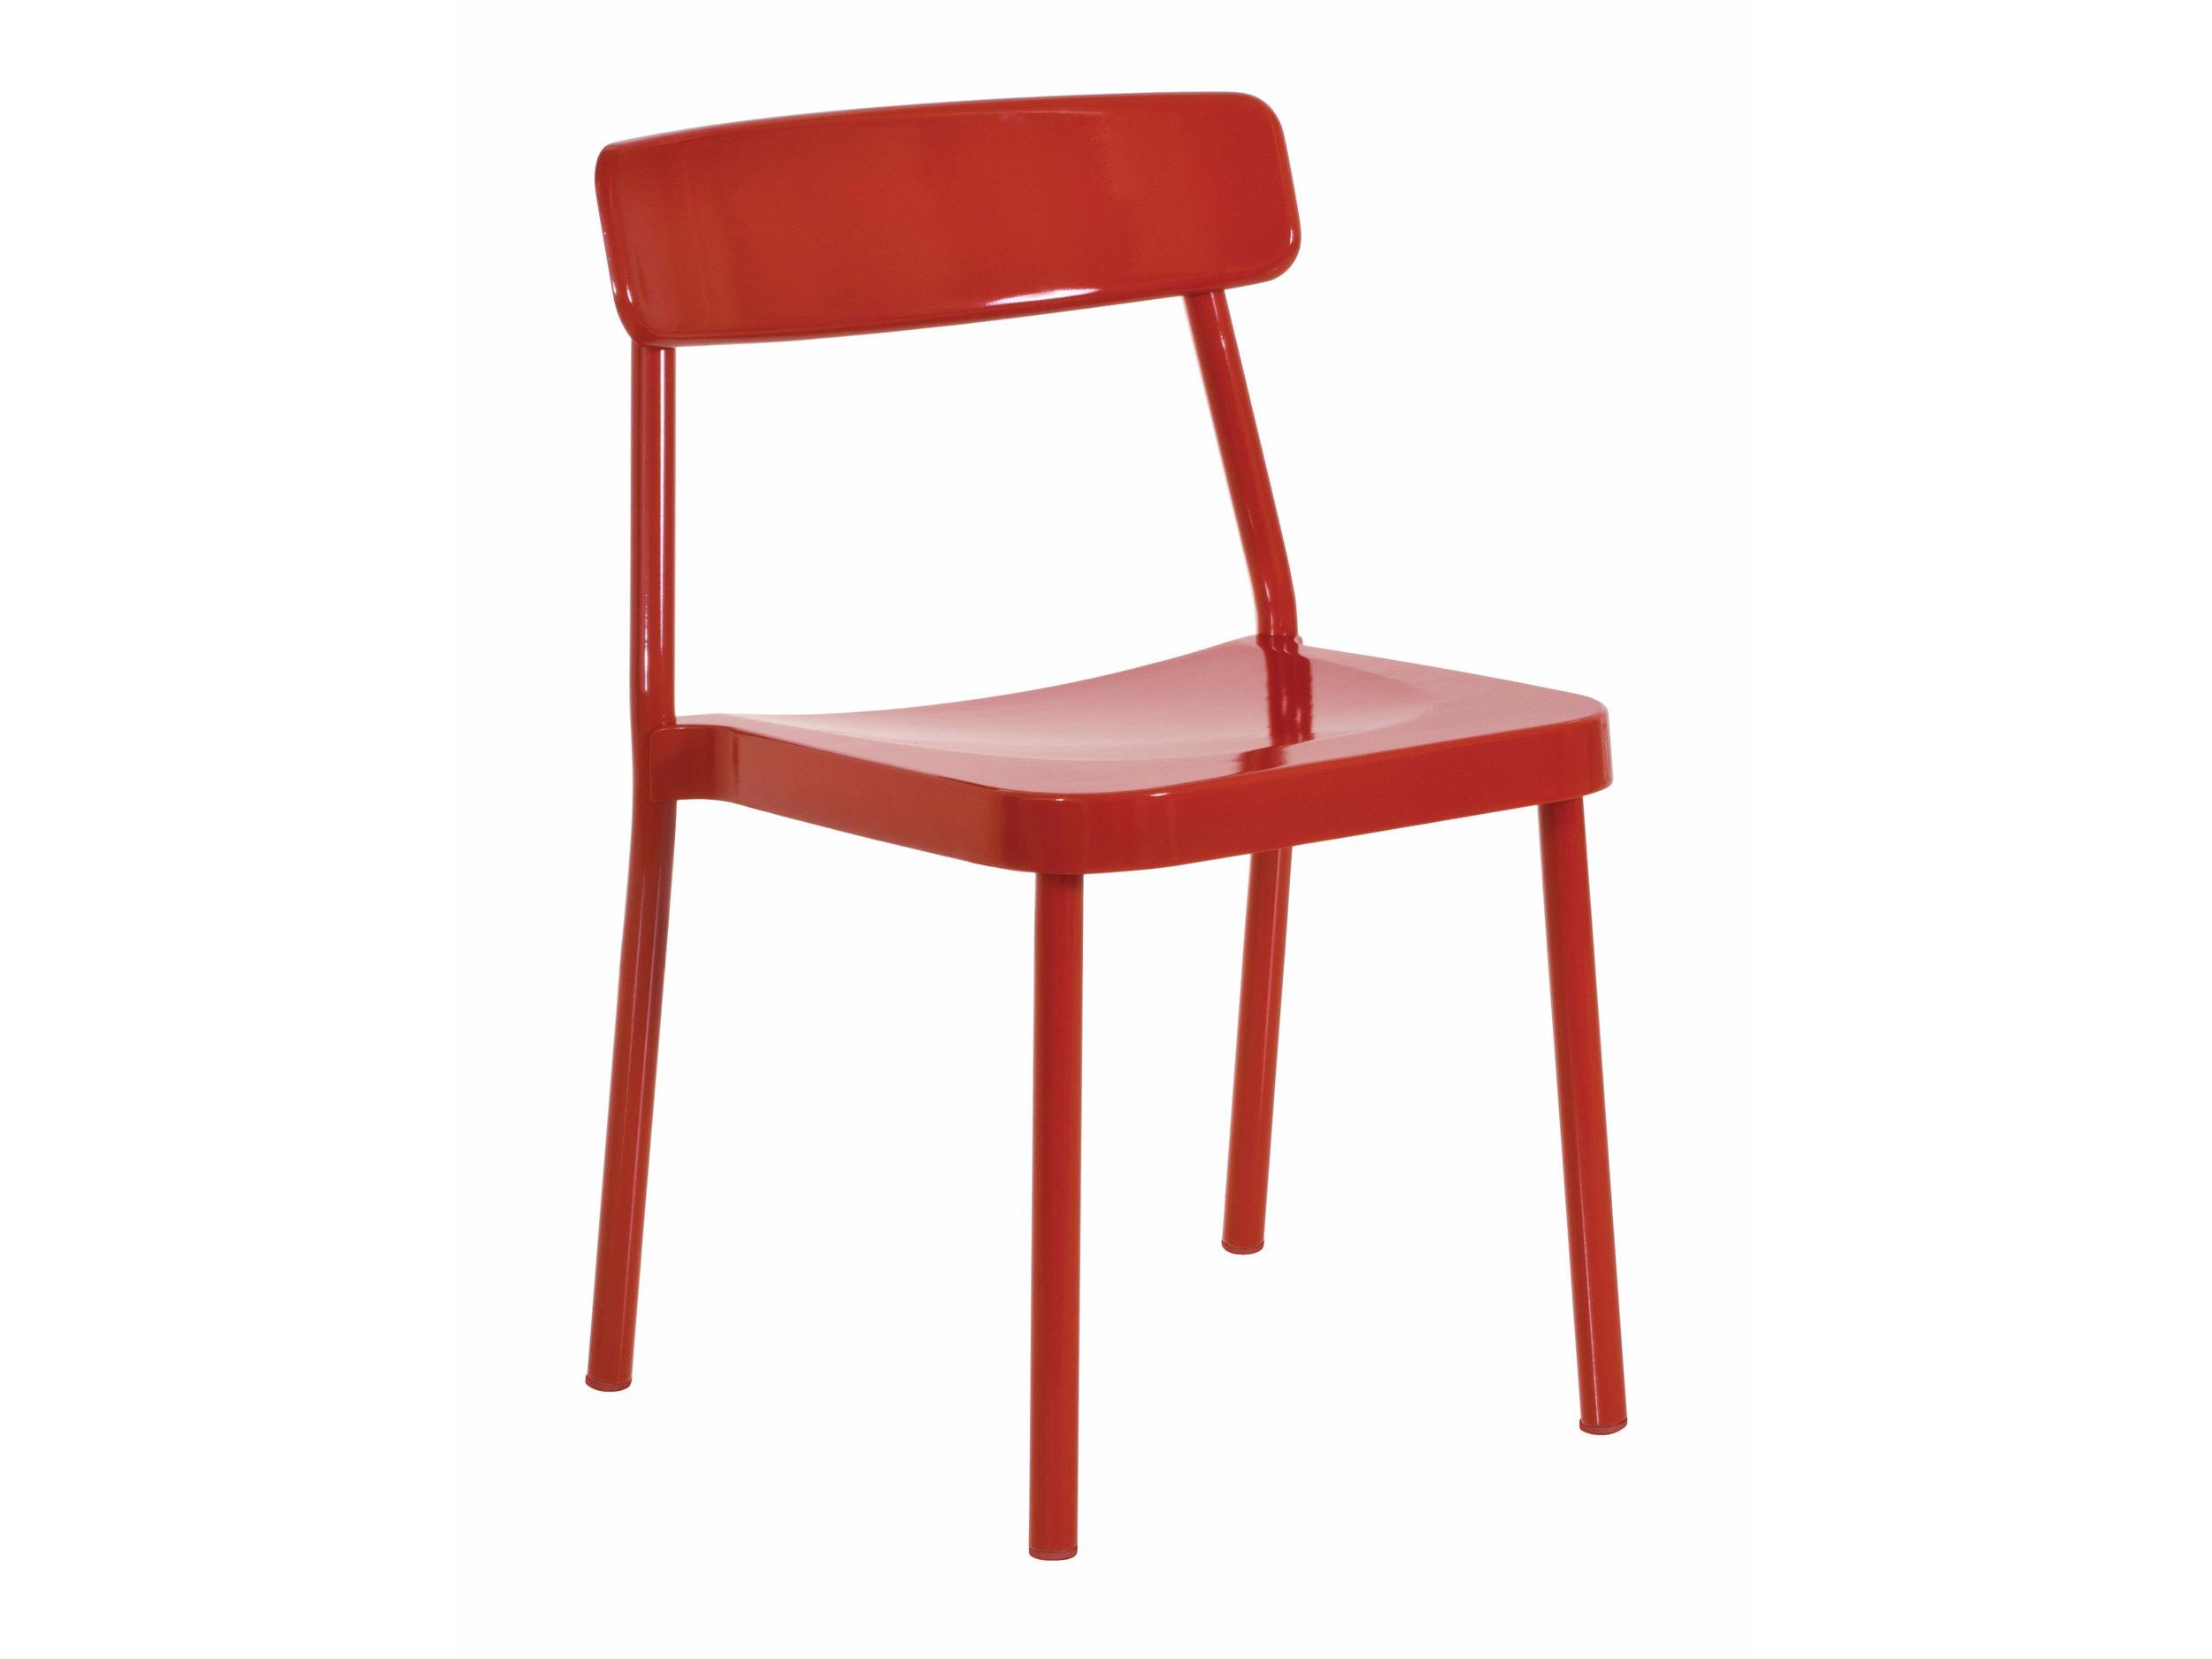 grace-chair-emu-252908-rel105ae91b.jpg